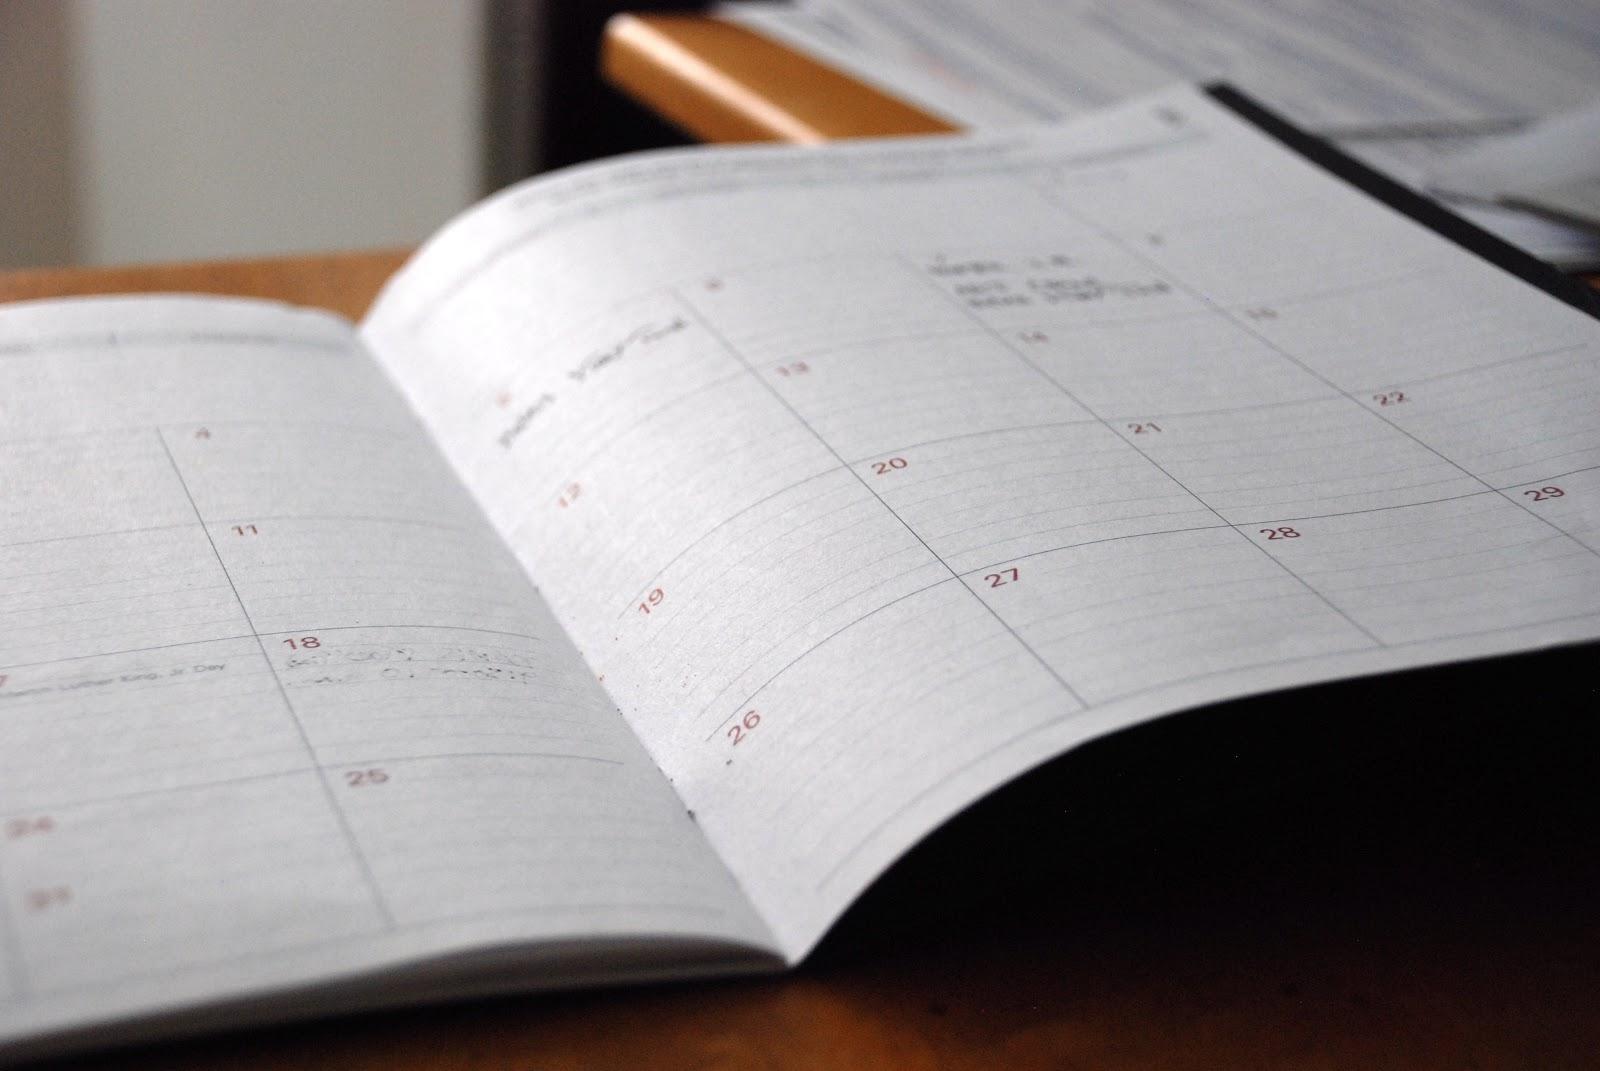 Opened paper calendar